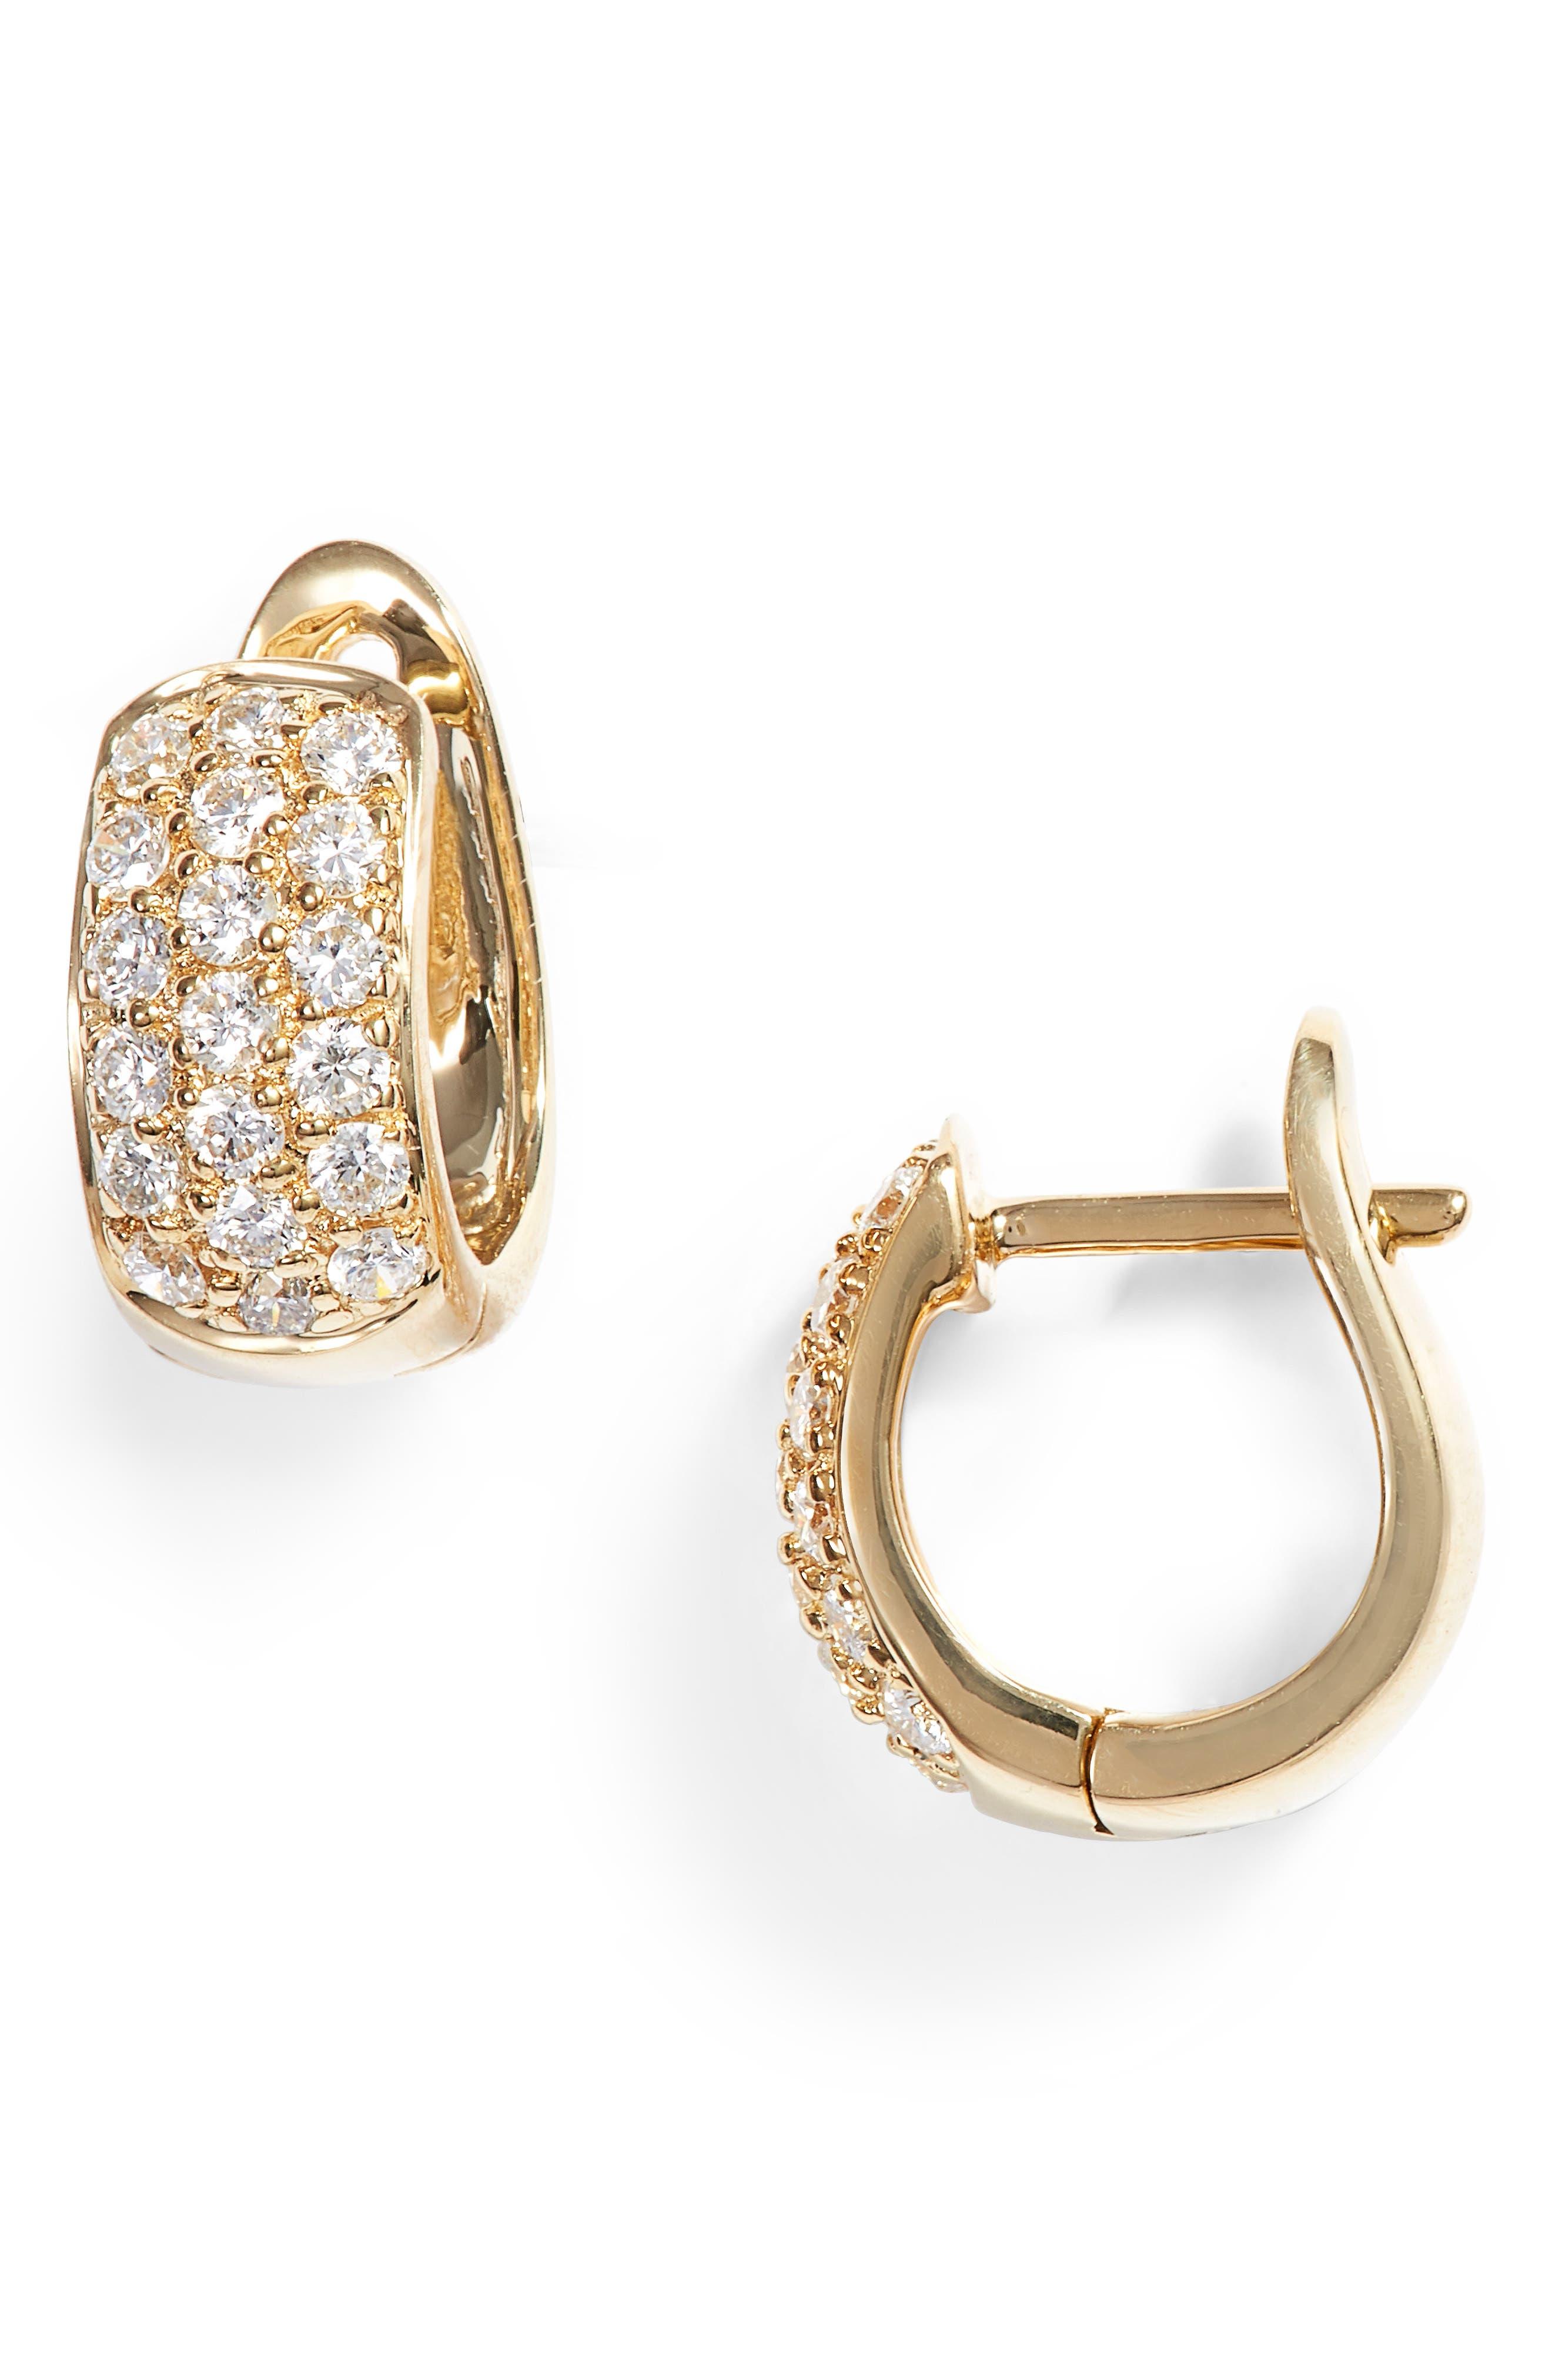 Dana Rebecca Designs Women S Jewelry